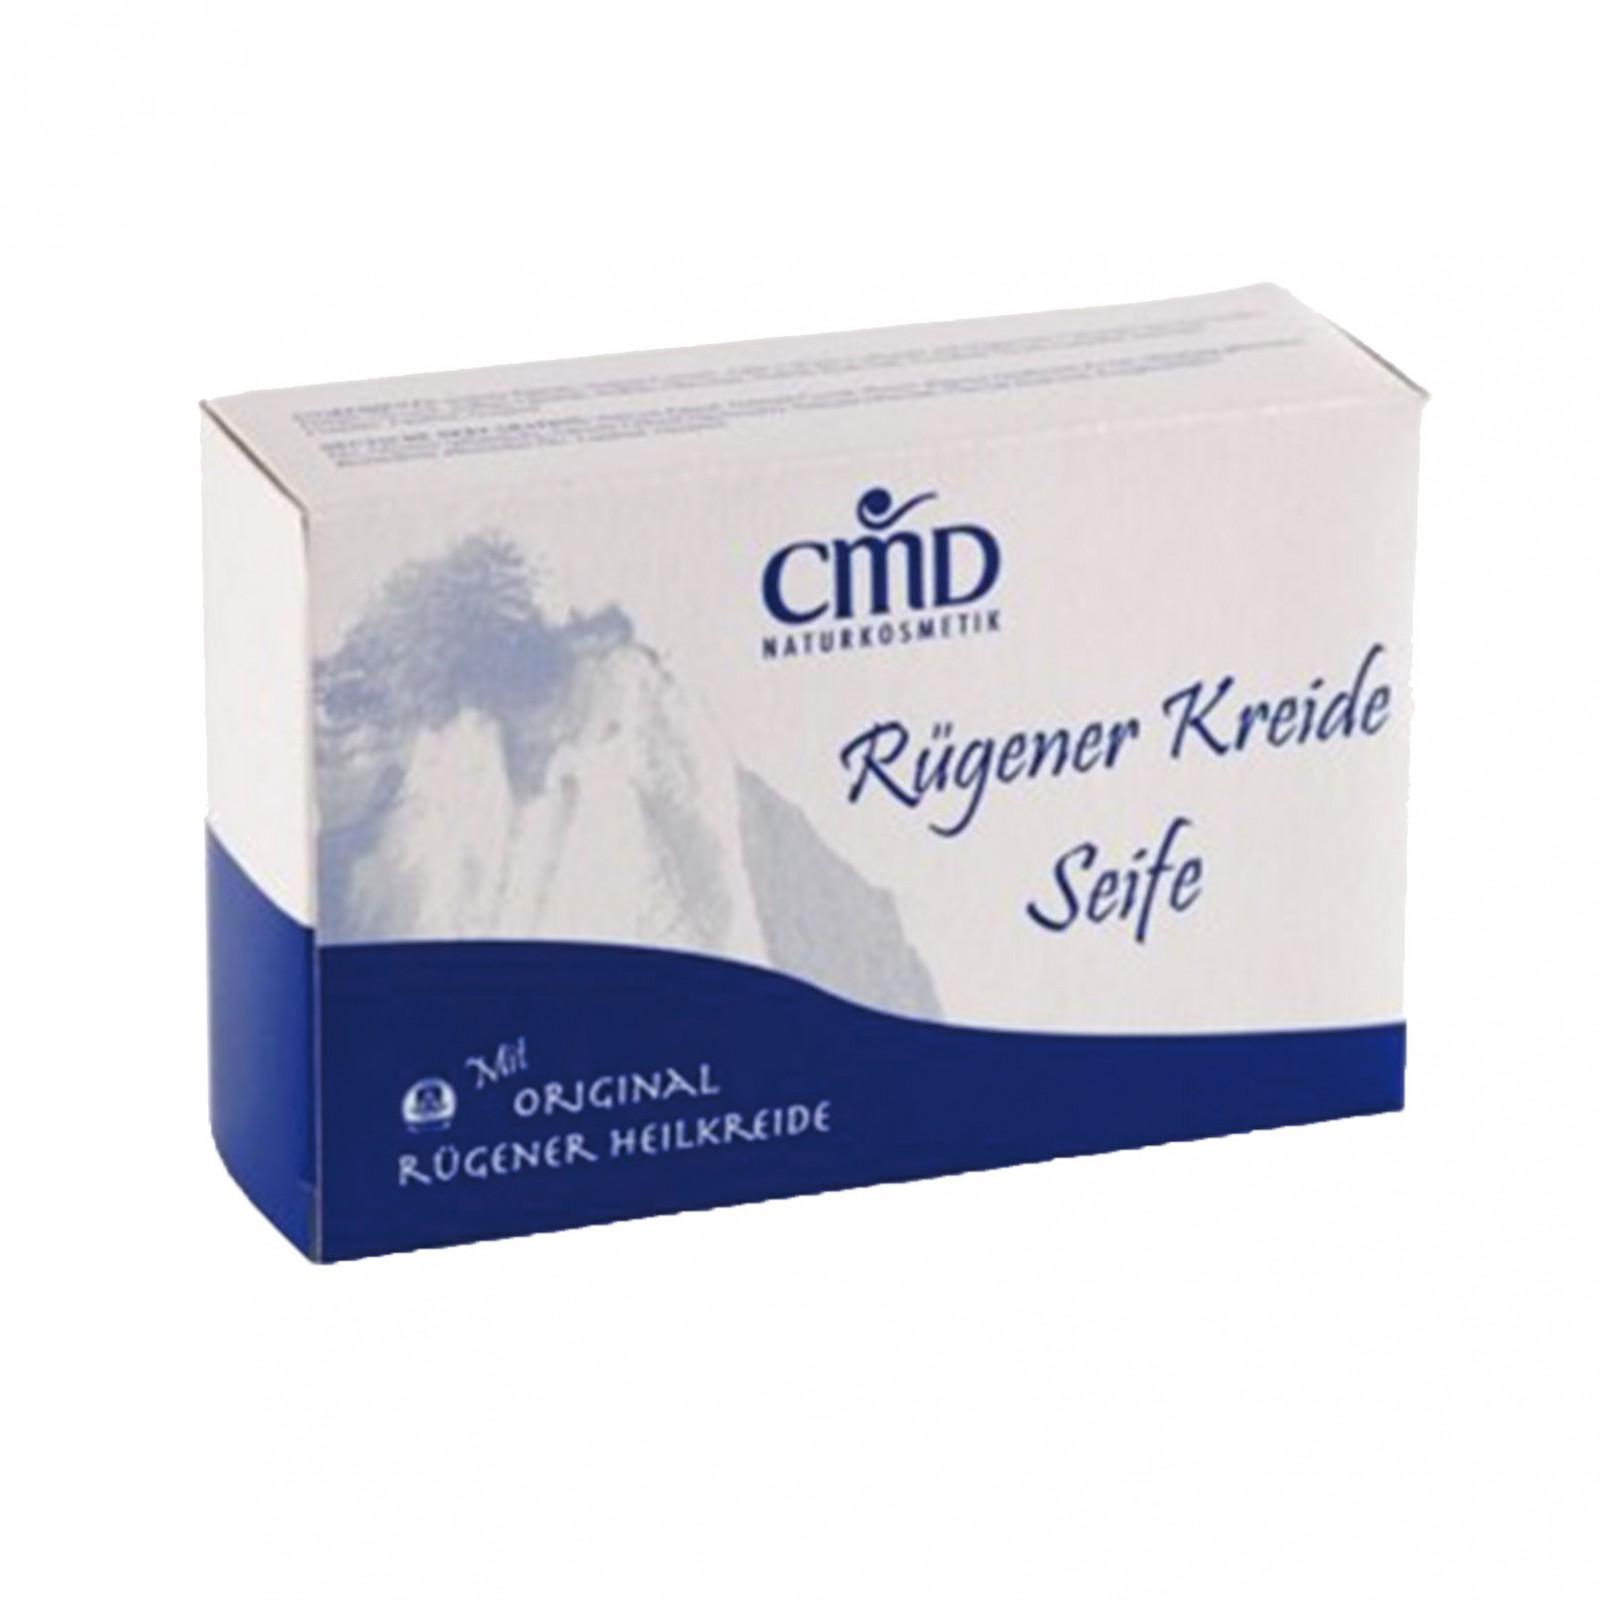 Rügener Kreide Seife 100 g - pH 10,0